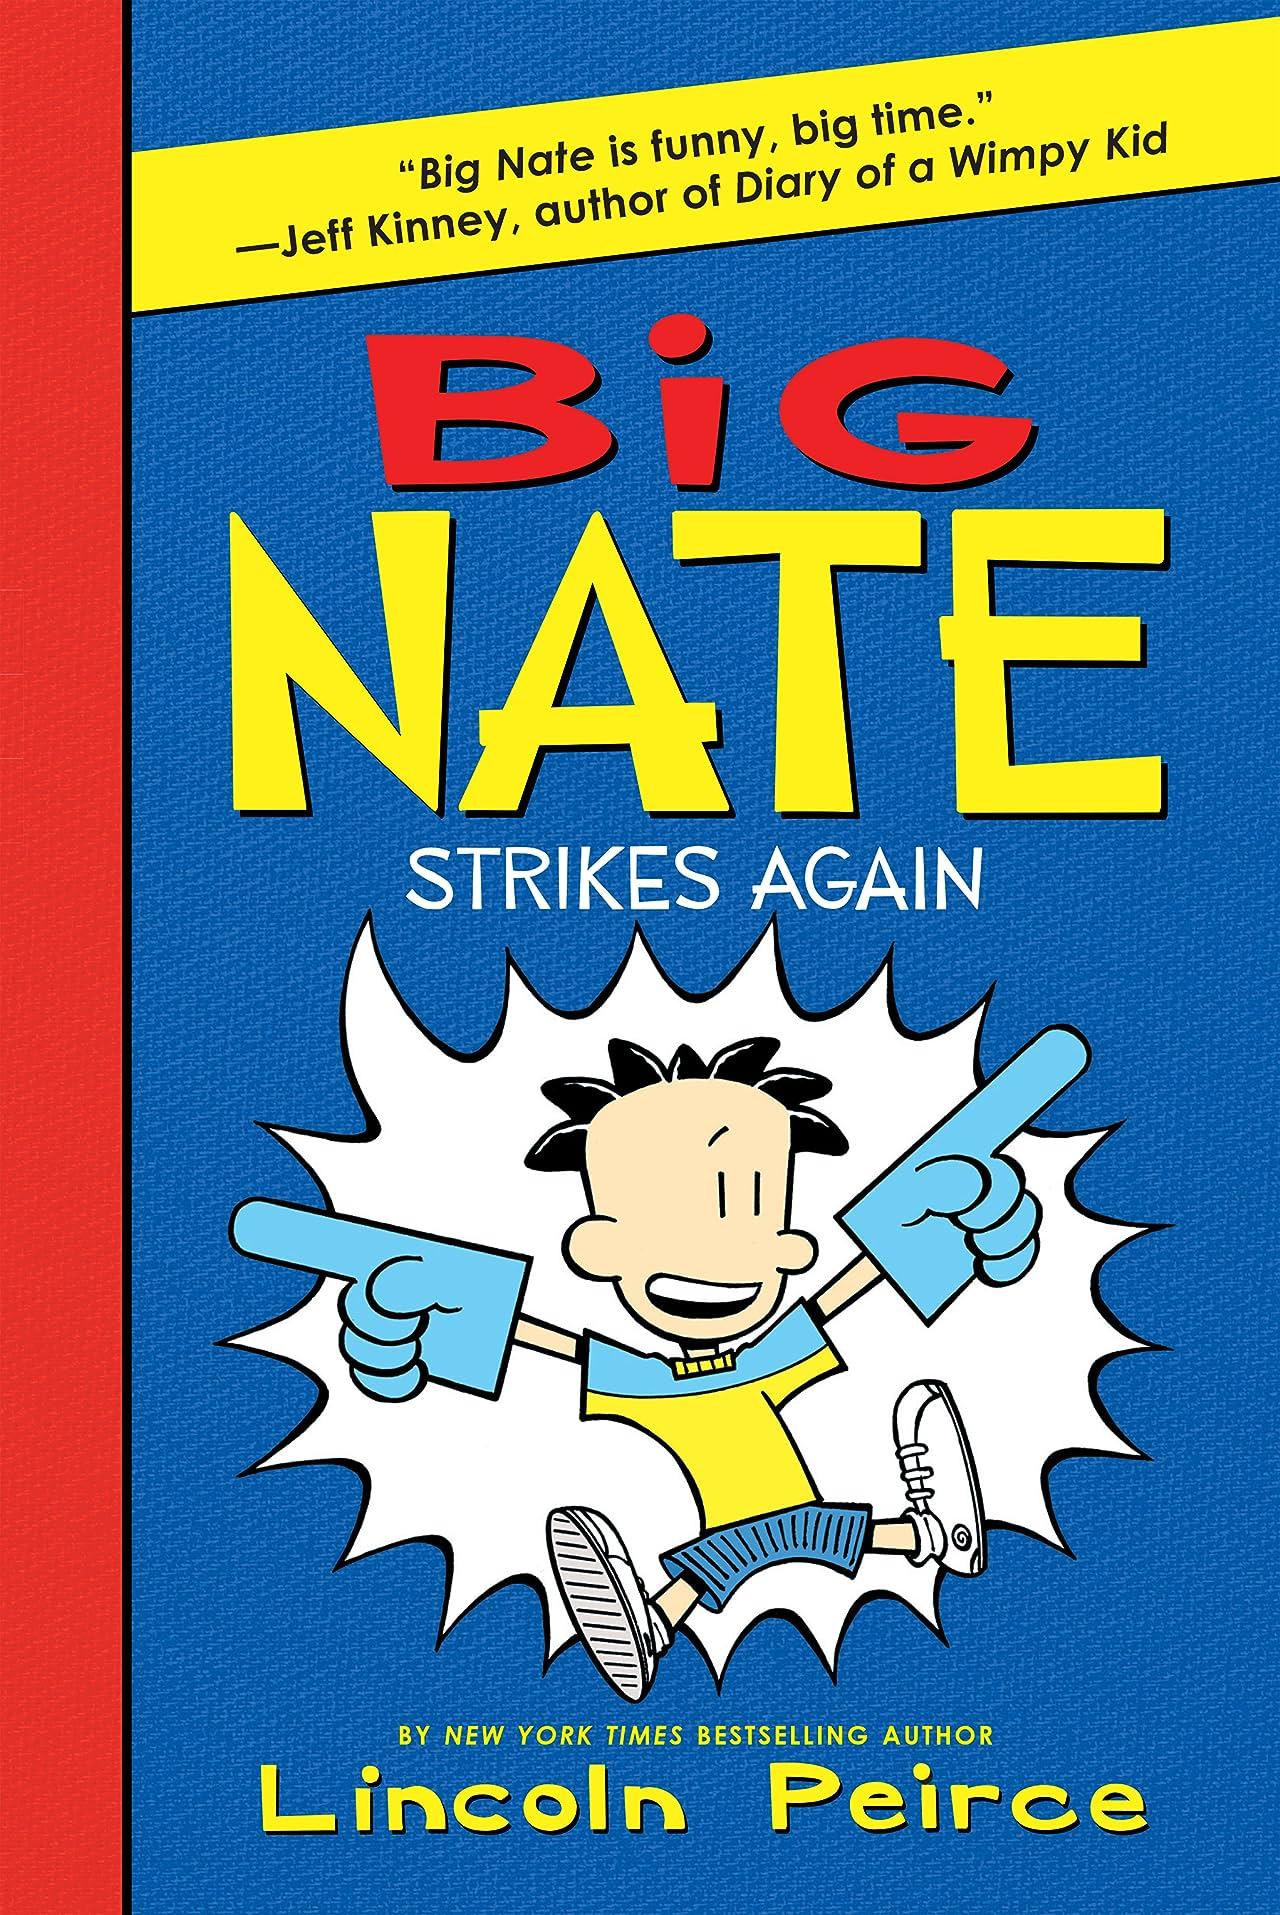 Big Nate Vol. 2: Strikes Again